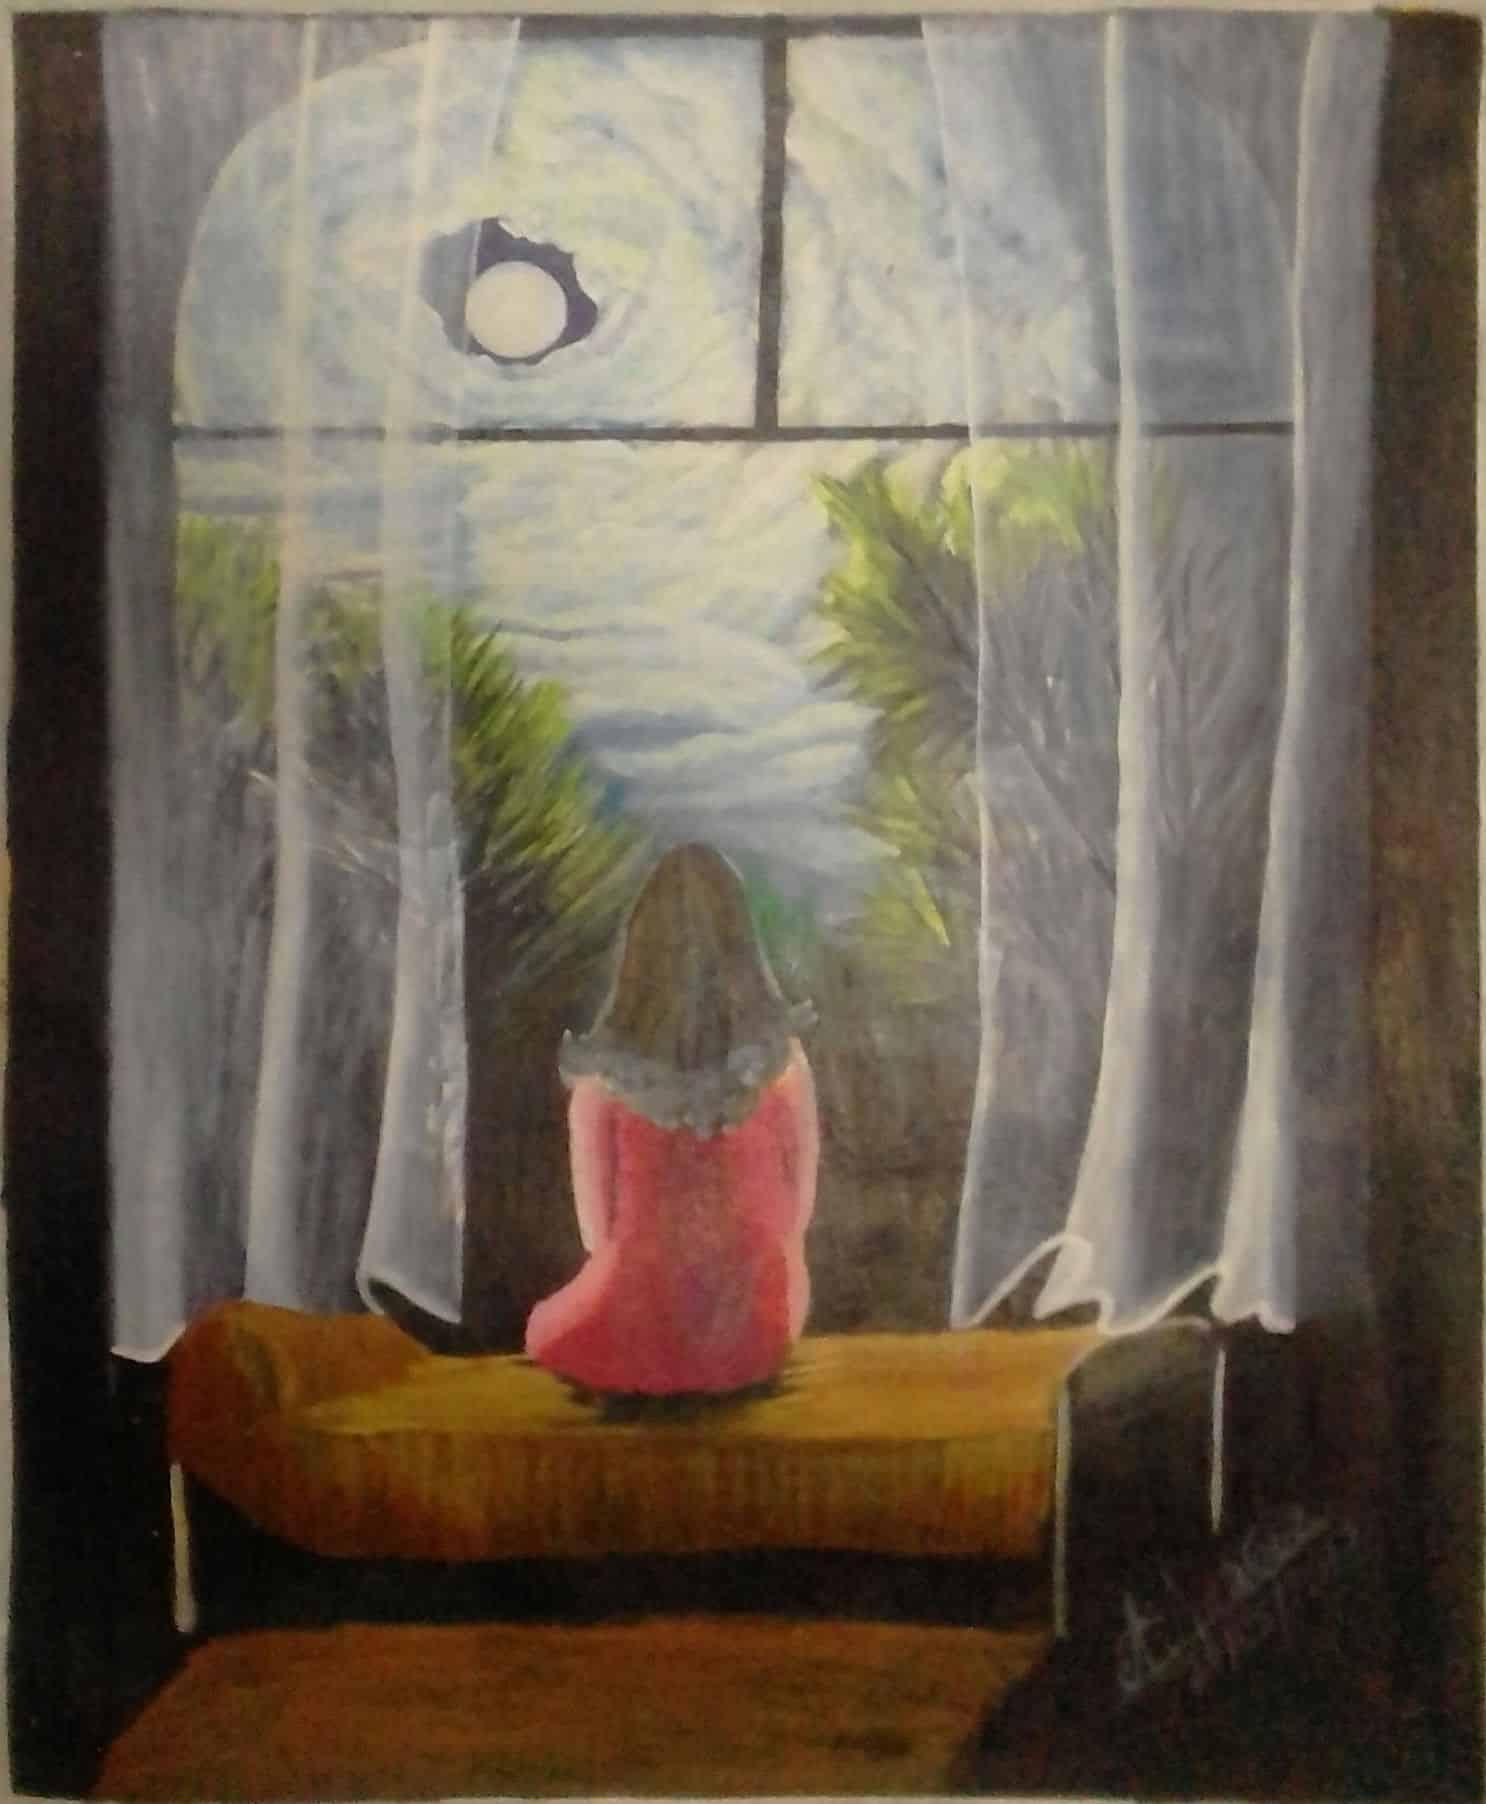 Mauritius Arts & Artists - mauritius-arts-asha-nawoor-moonlight-view